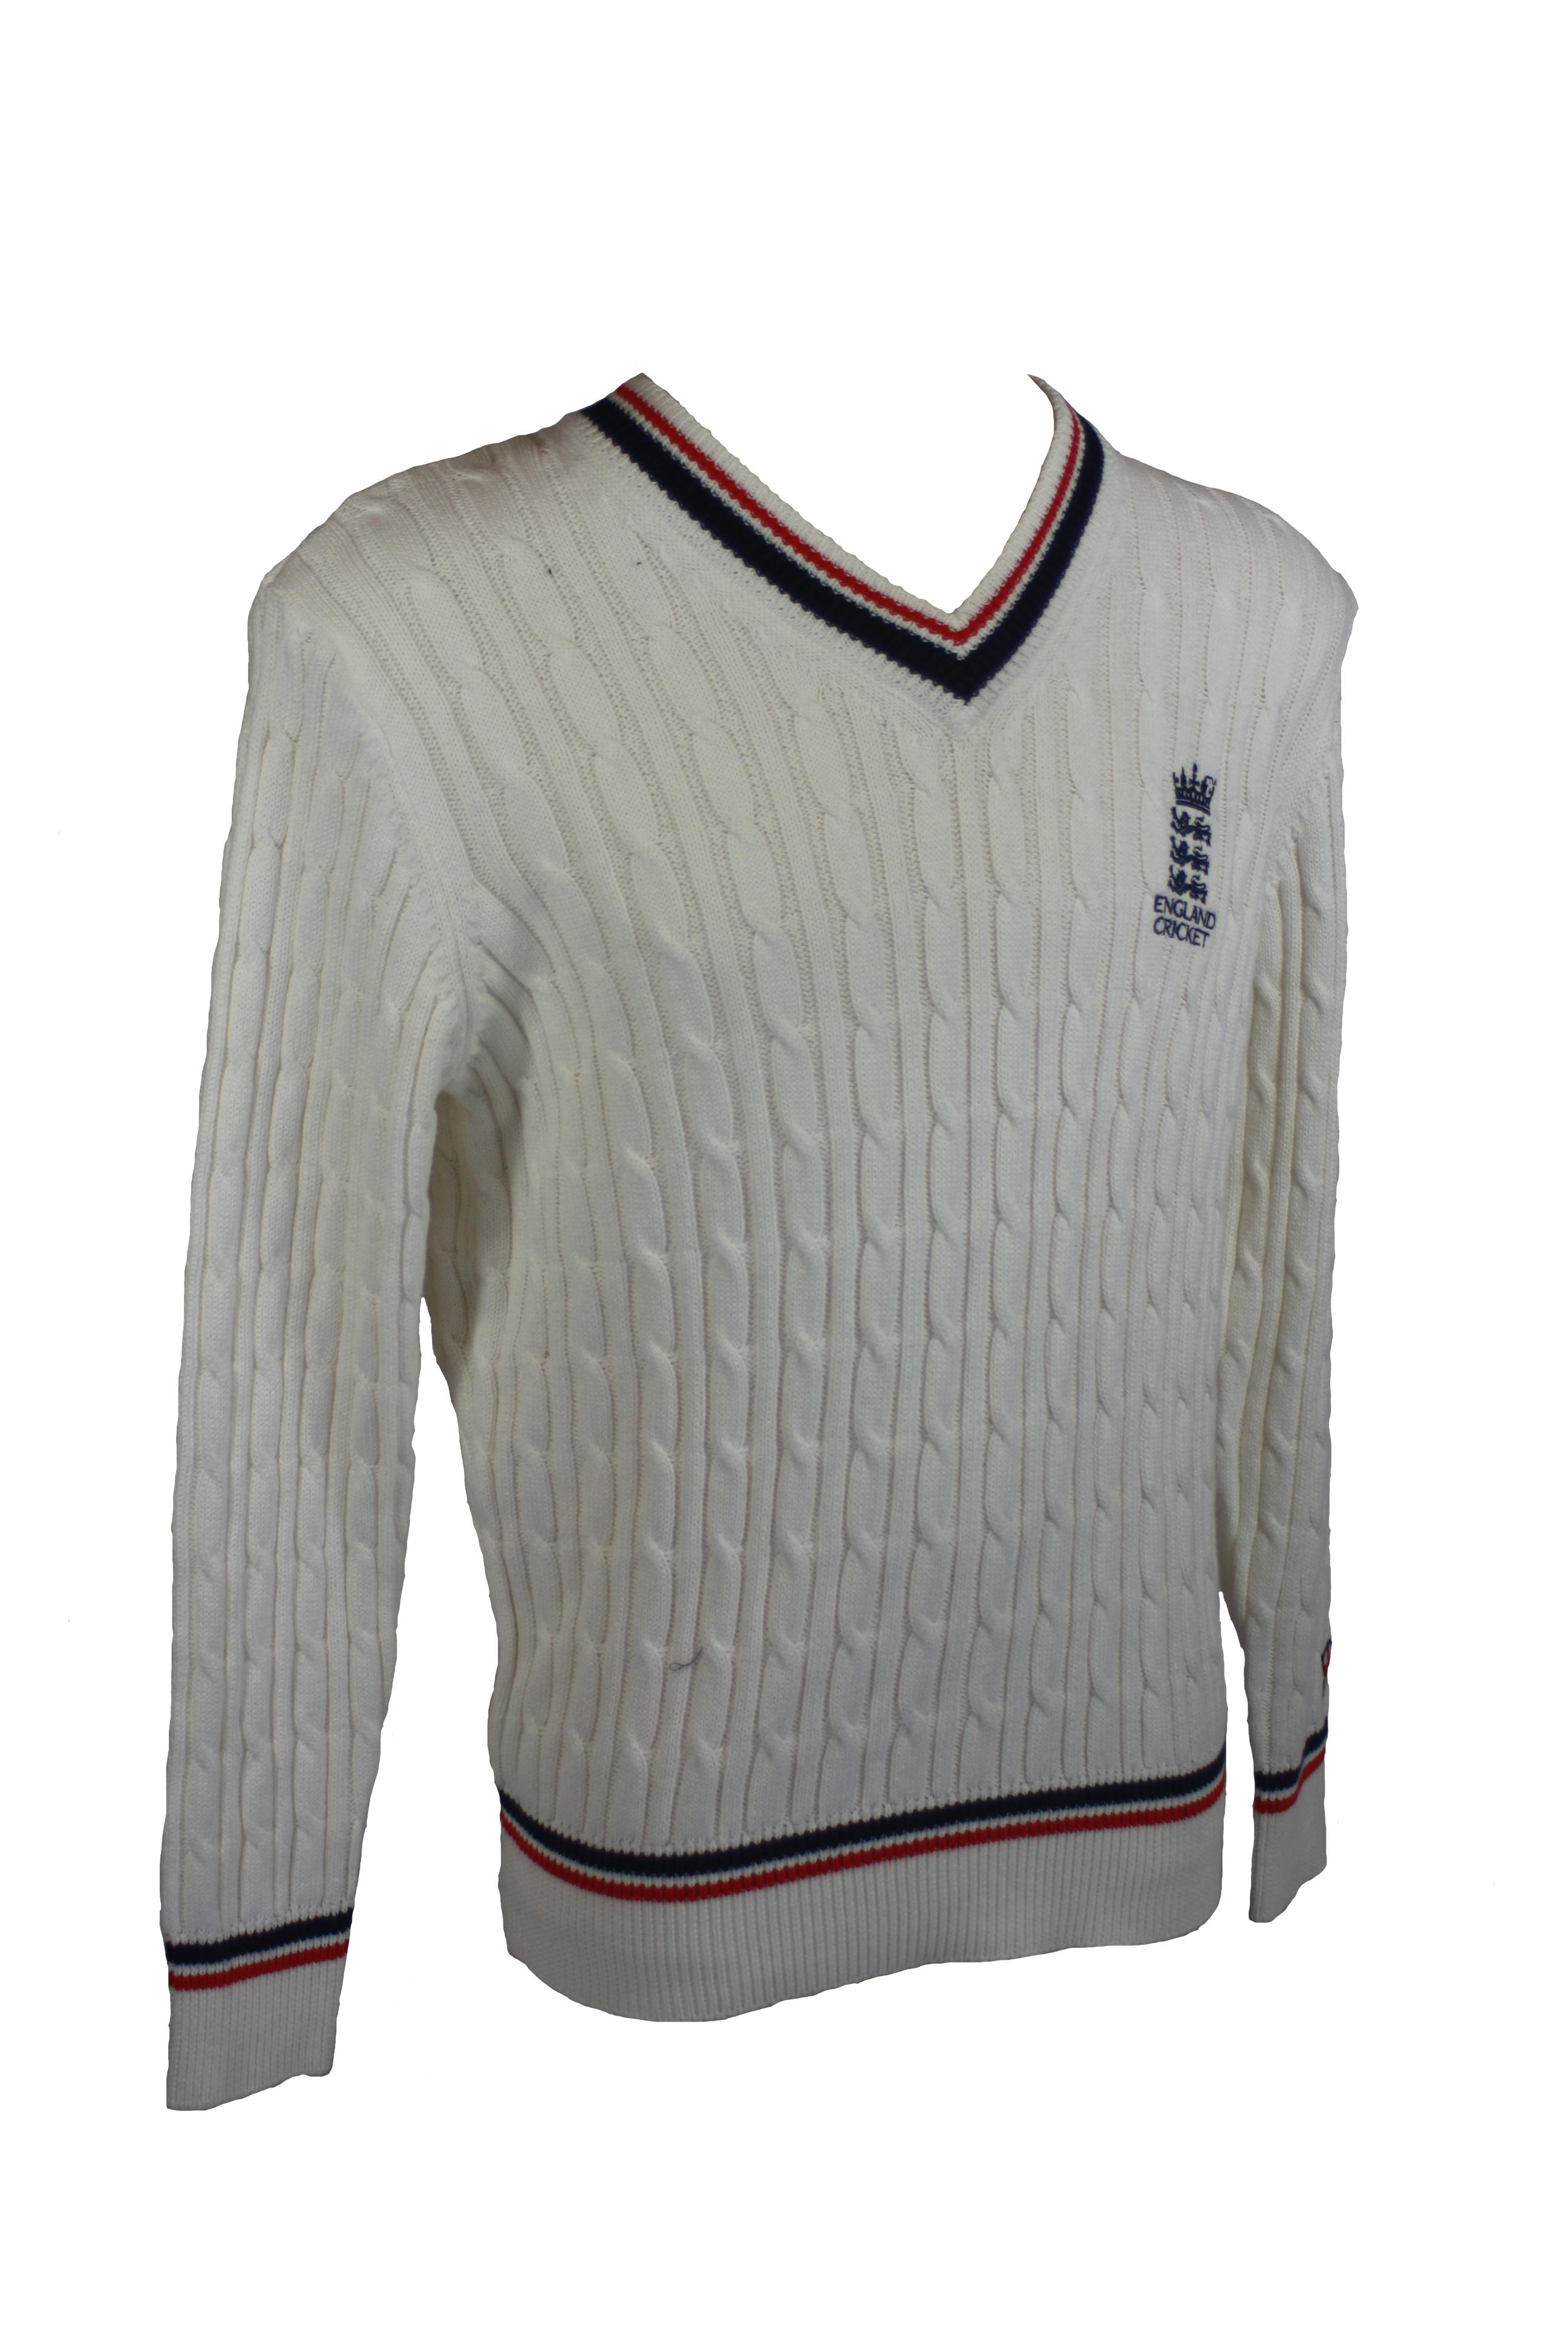 Knitting Pattern Cricket Jumper : England Cricket Classic Knit Jumper White Gloucestershire Cricket